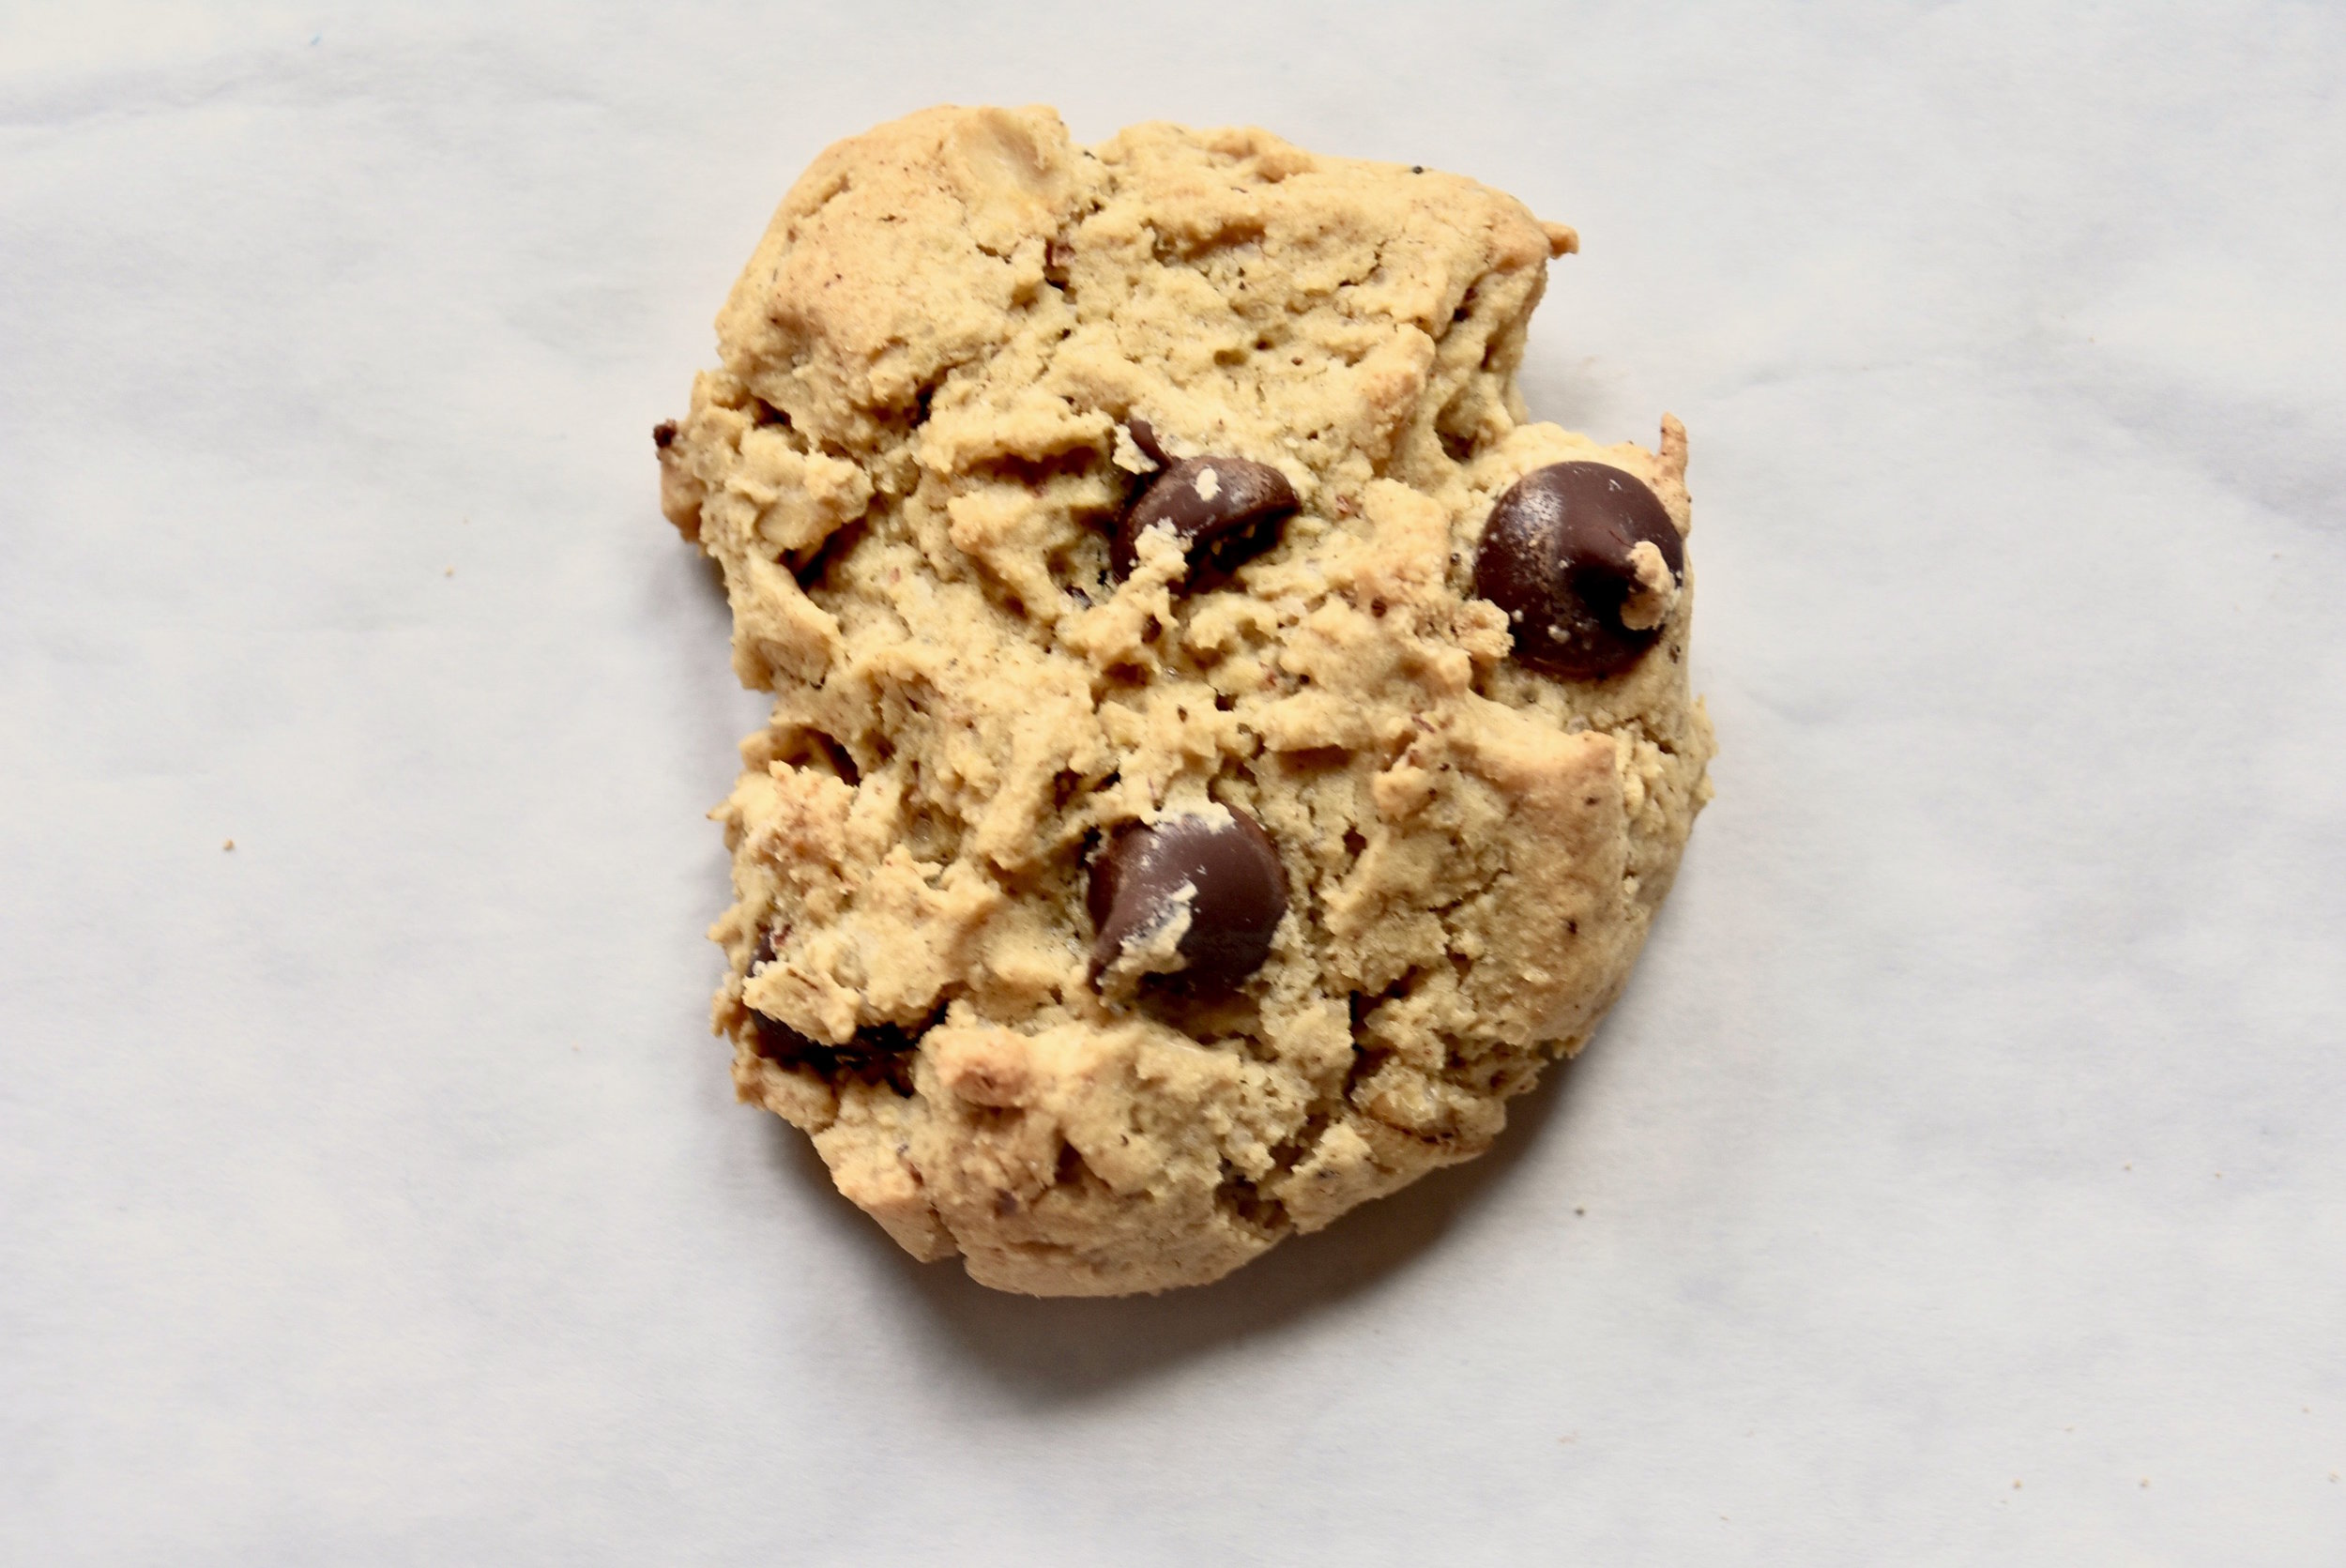 Buchanan Bourbon Chocolate Chip Cookies - my favorite chocolate chip cookie ever. Period.